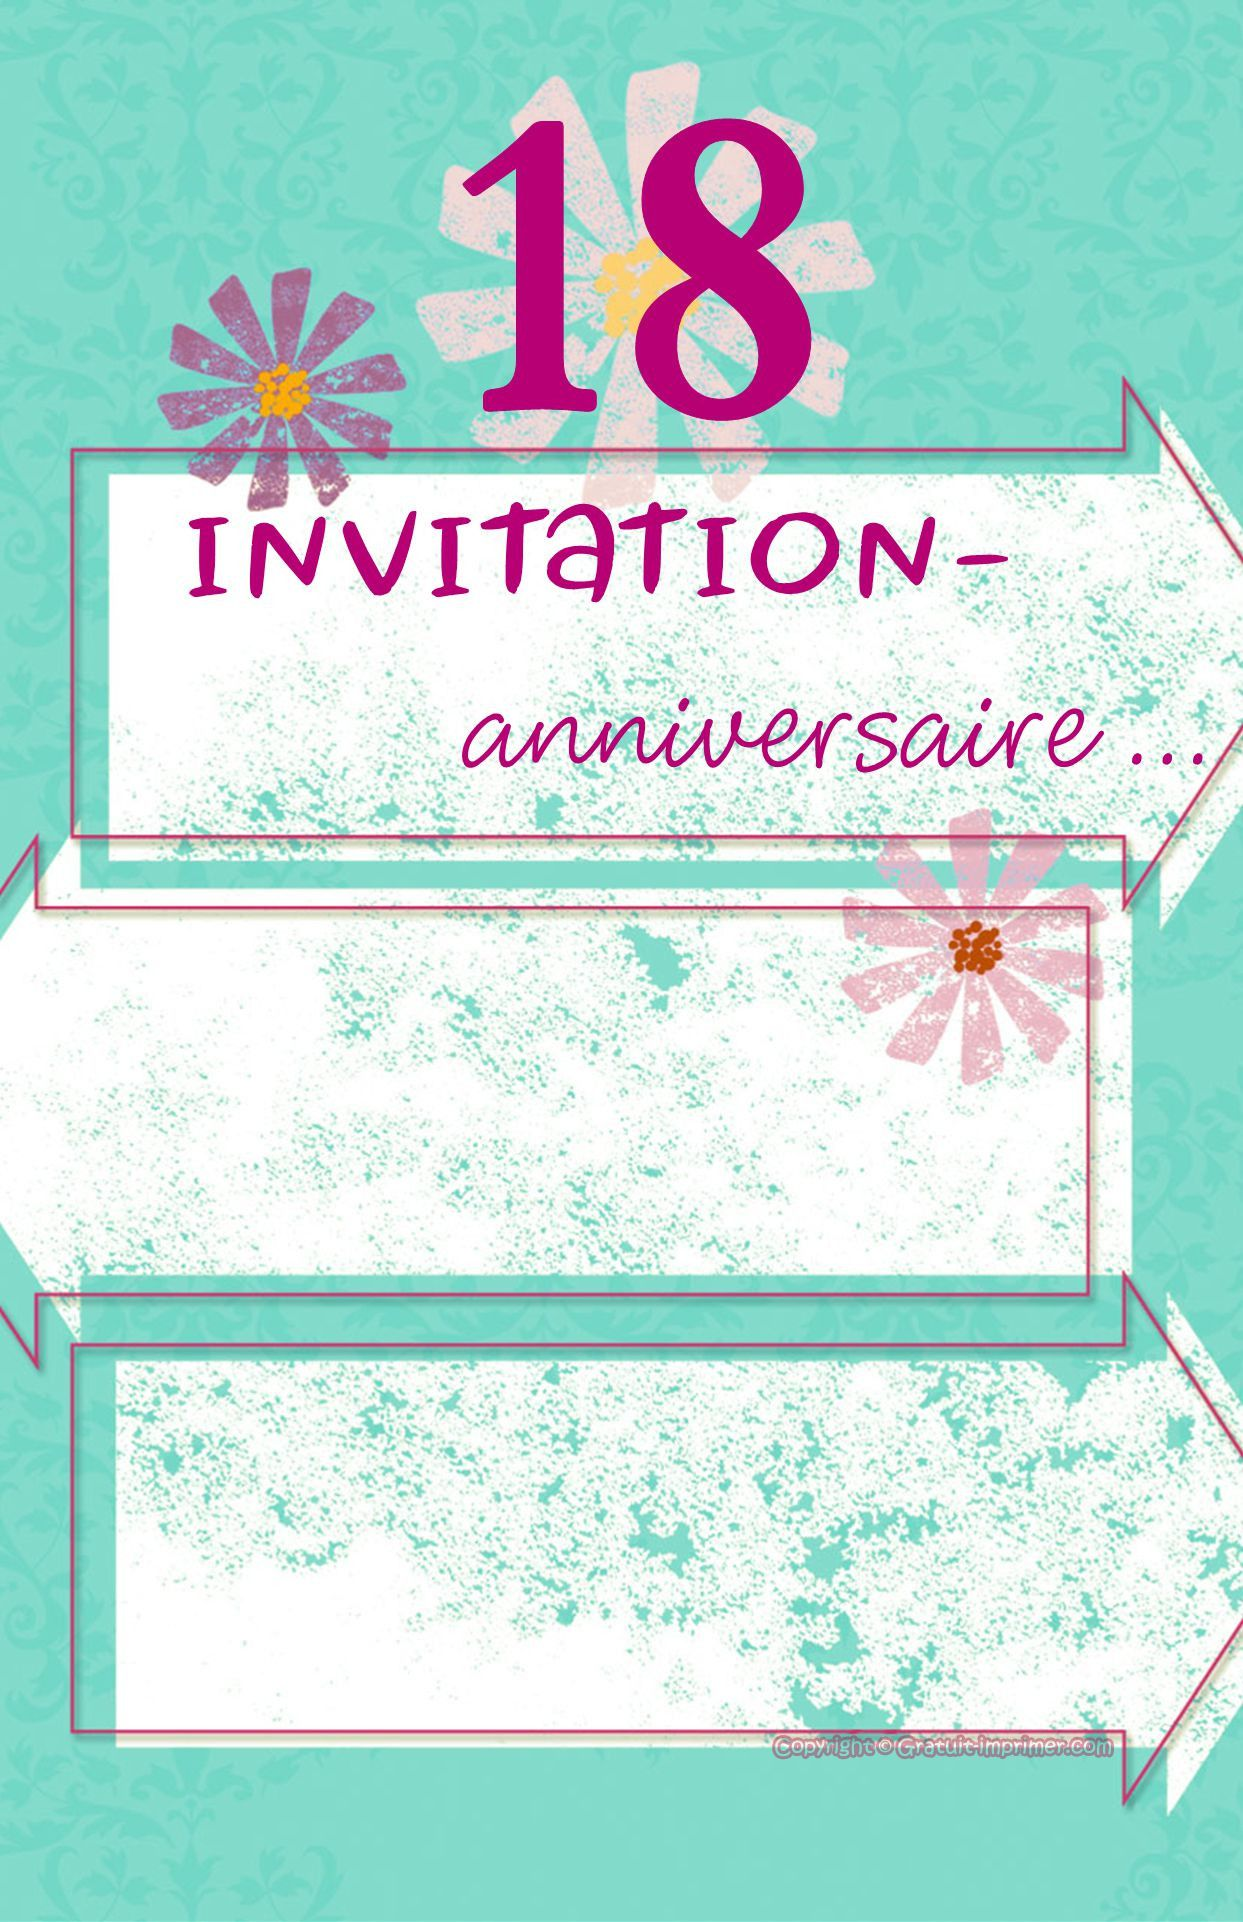 Carte Invitation Anniversaire 18 Ans Fille Gratuite A Imprimer Les 20 Mei Carte Invitation Anniversaire Gratuite Carte Invitation Anniversaire Carte Invitation